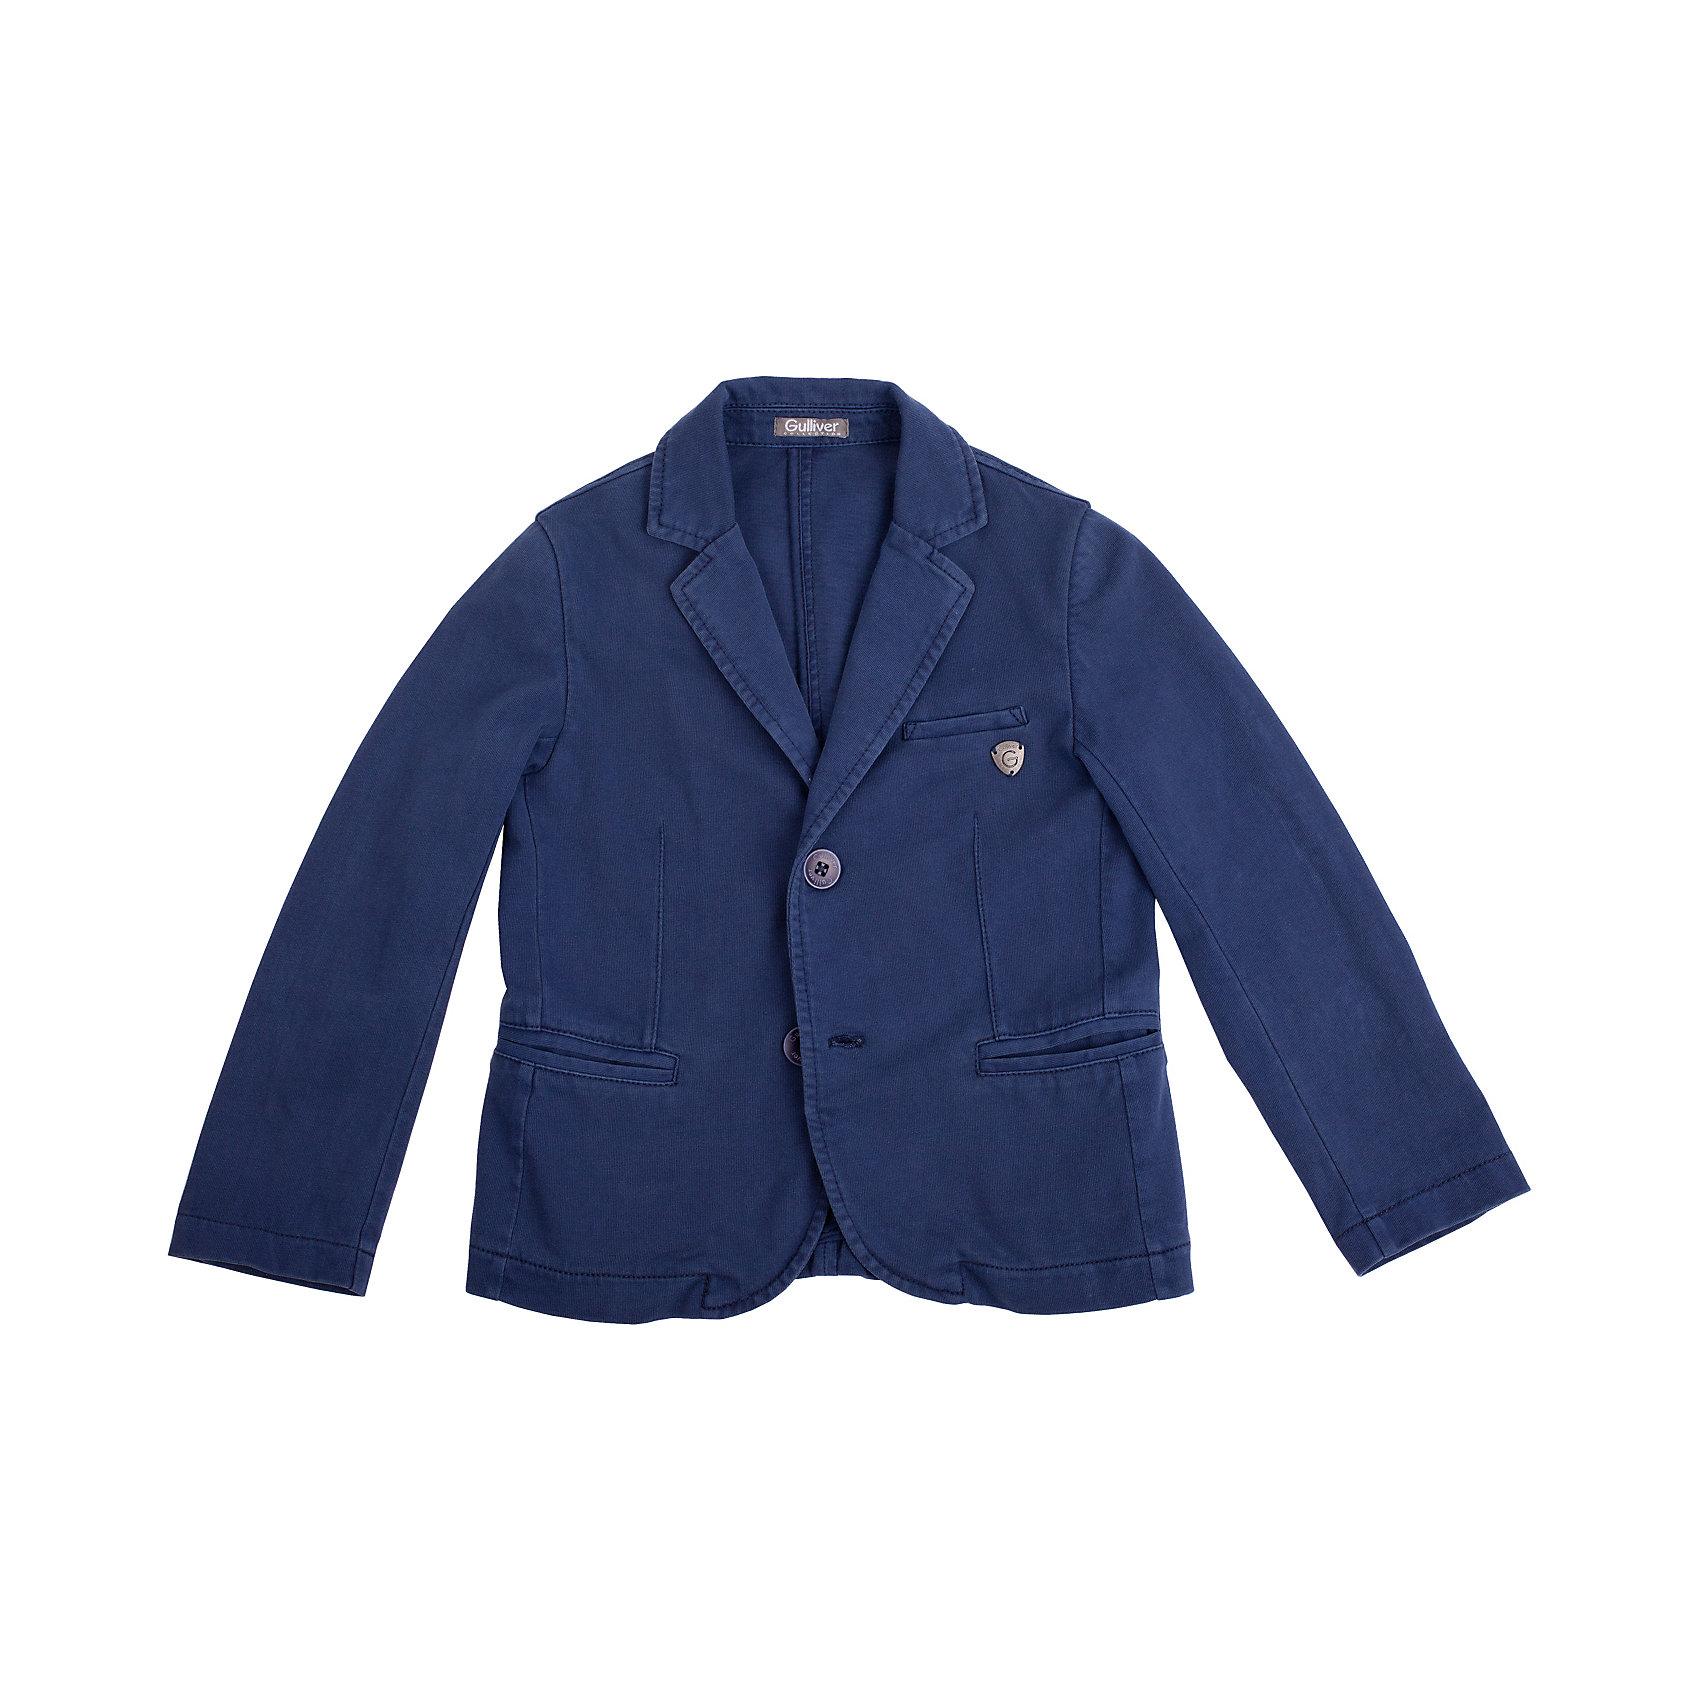 Gulliver Пиджак для мальчика Gulliver mabro пиджак